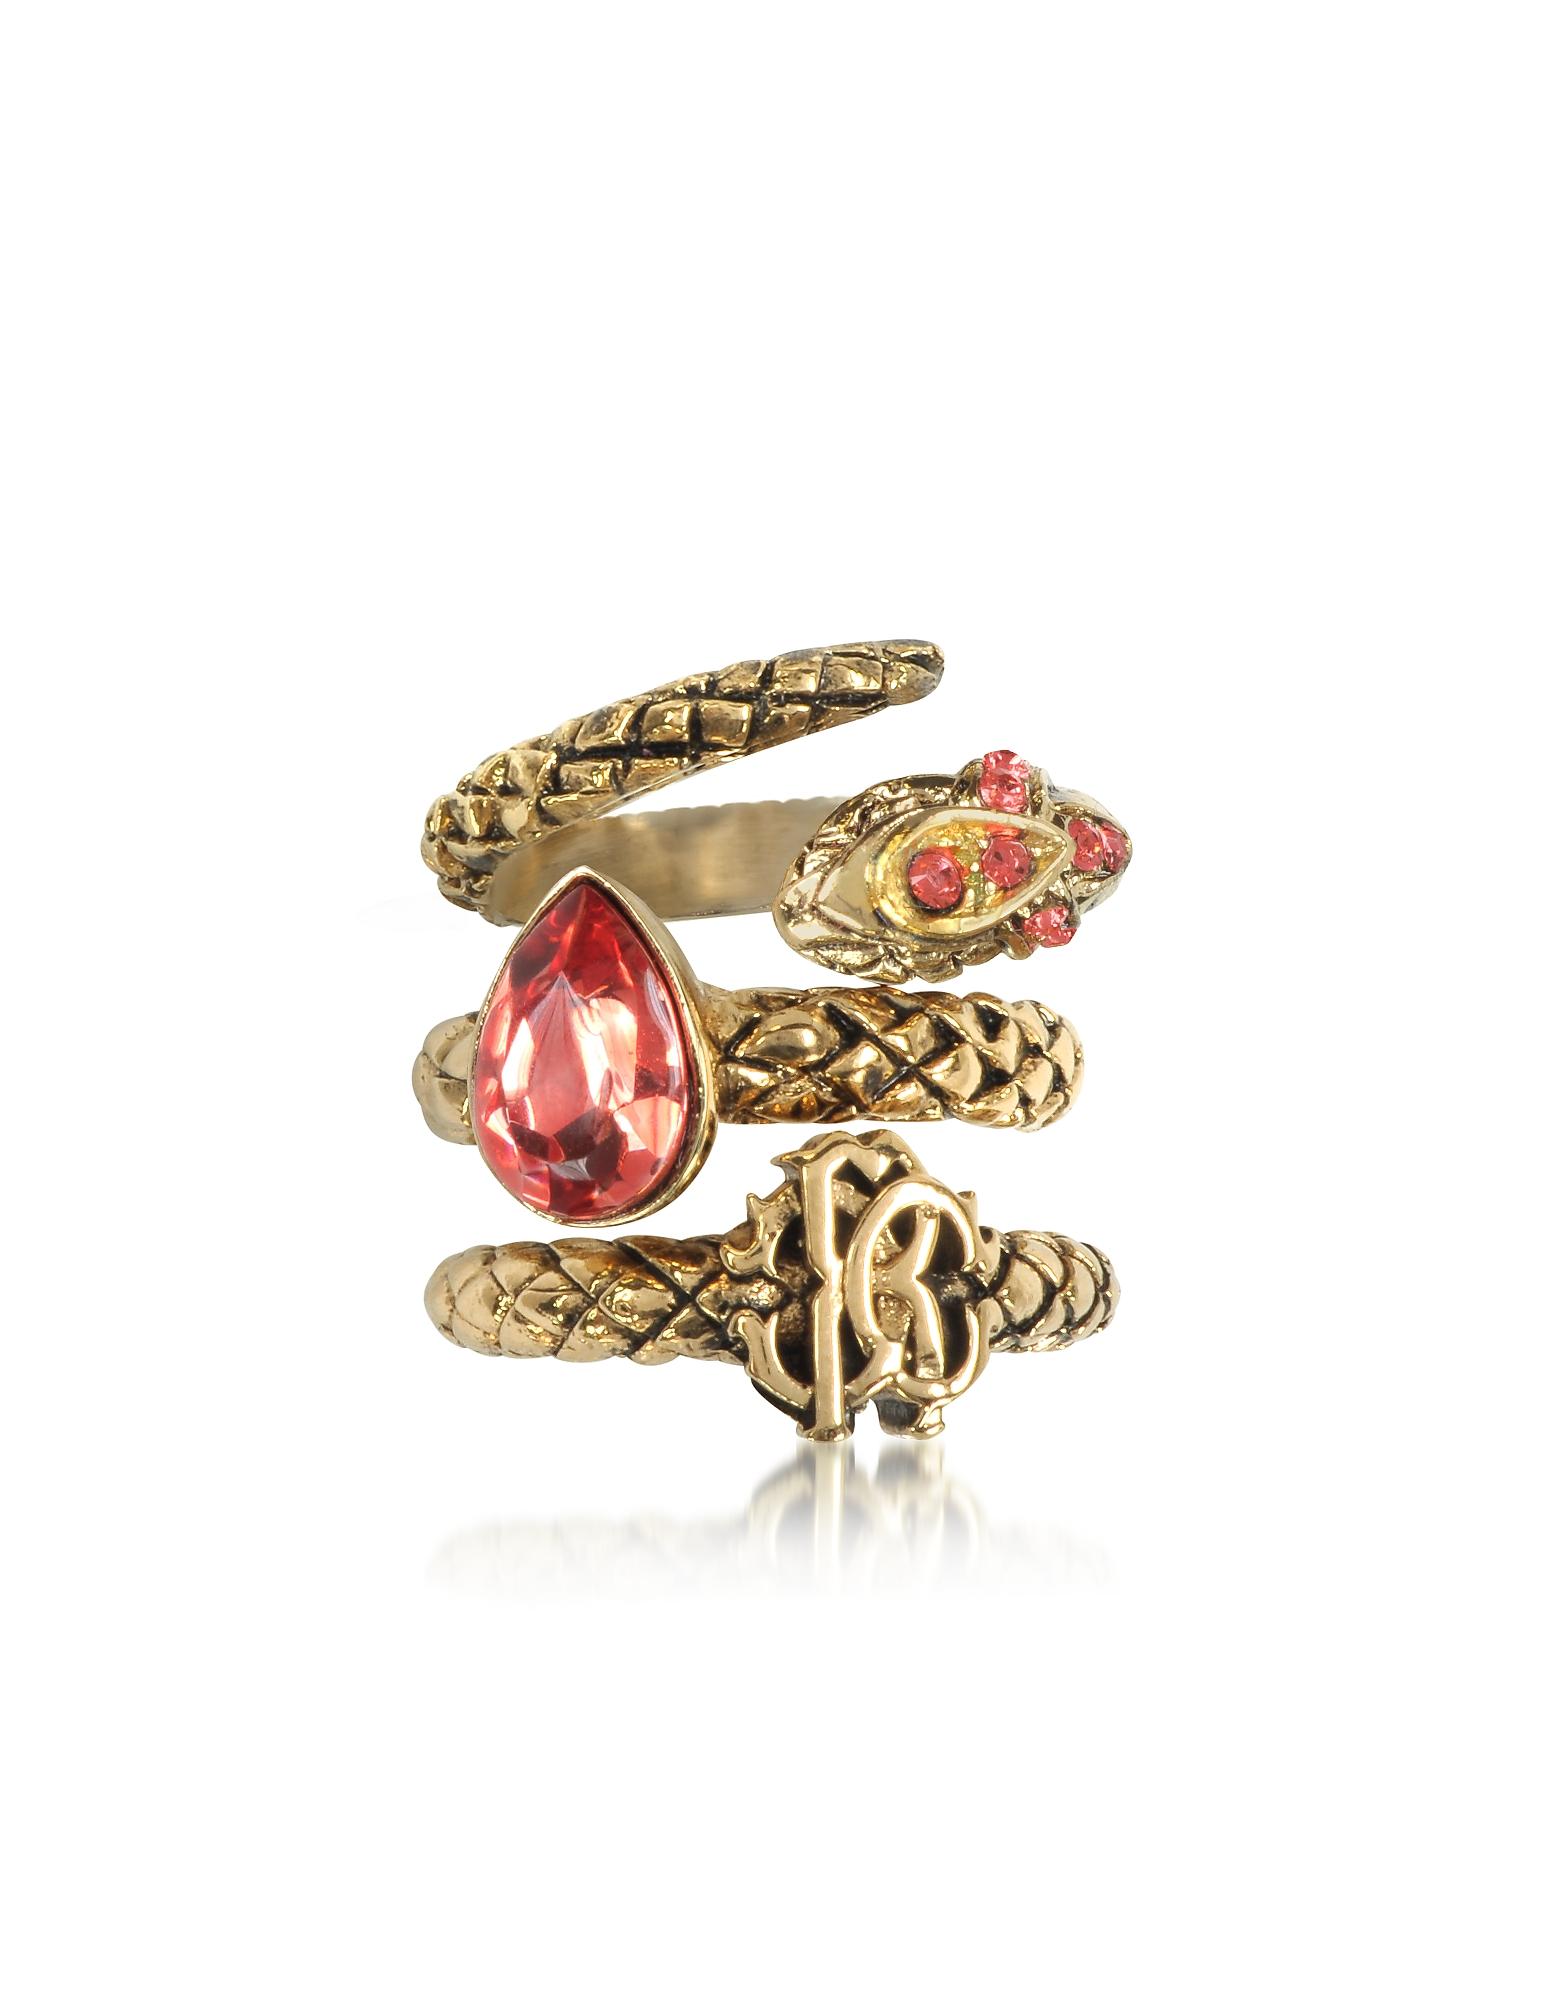 Roberto Cavalli Rings, Goldtone Metal Triple Ring w/Red Crystals